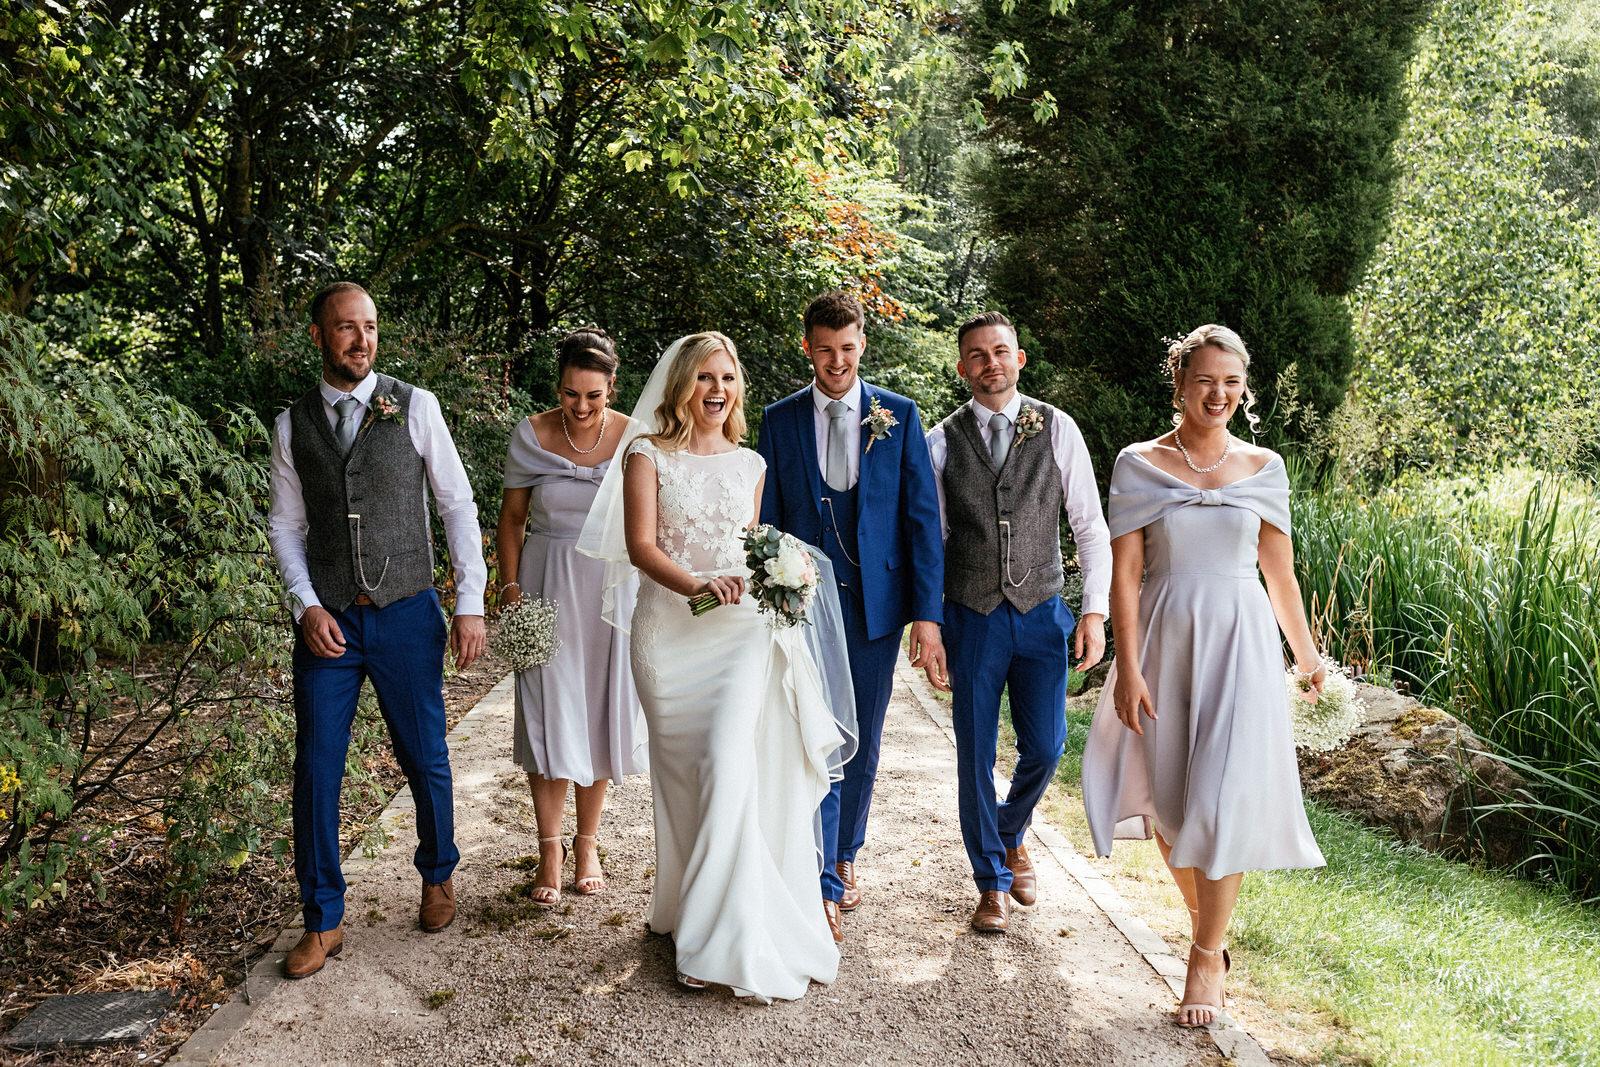 Moddershall-Oaks-Spa-Wedding-Photographer-036.jpg